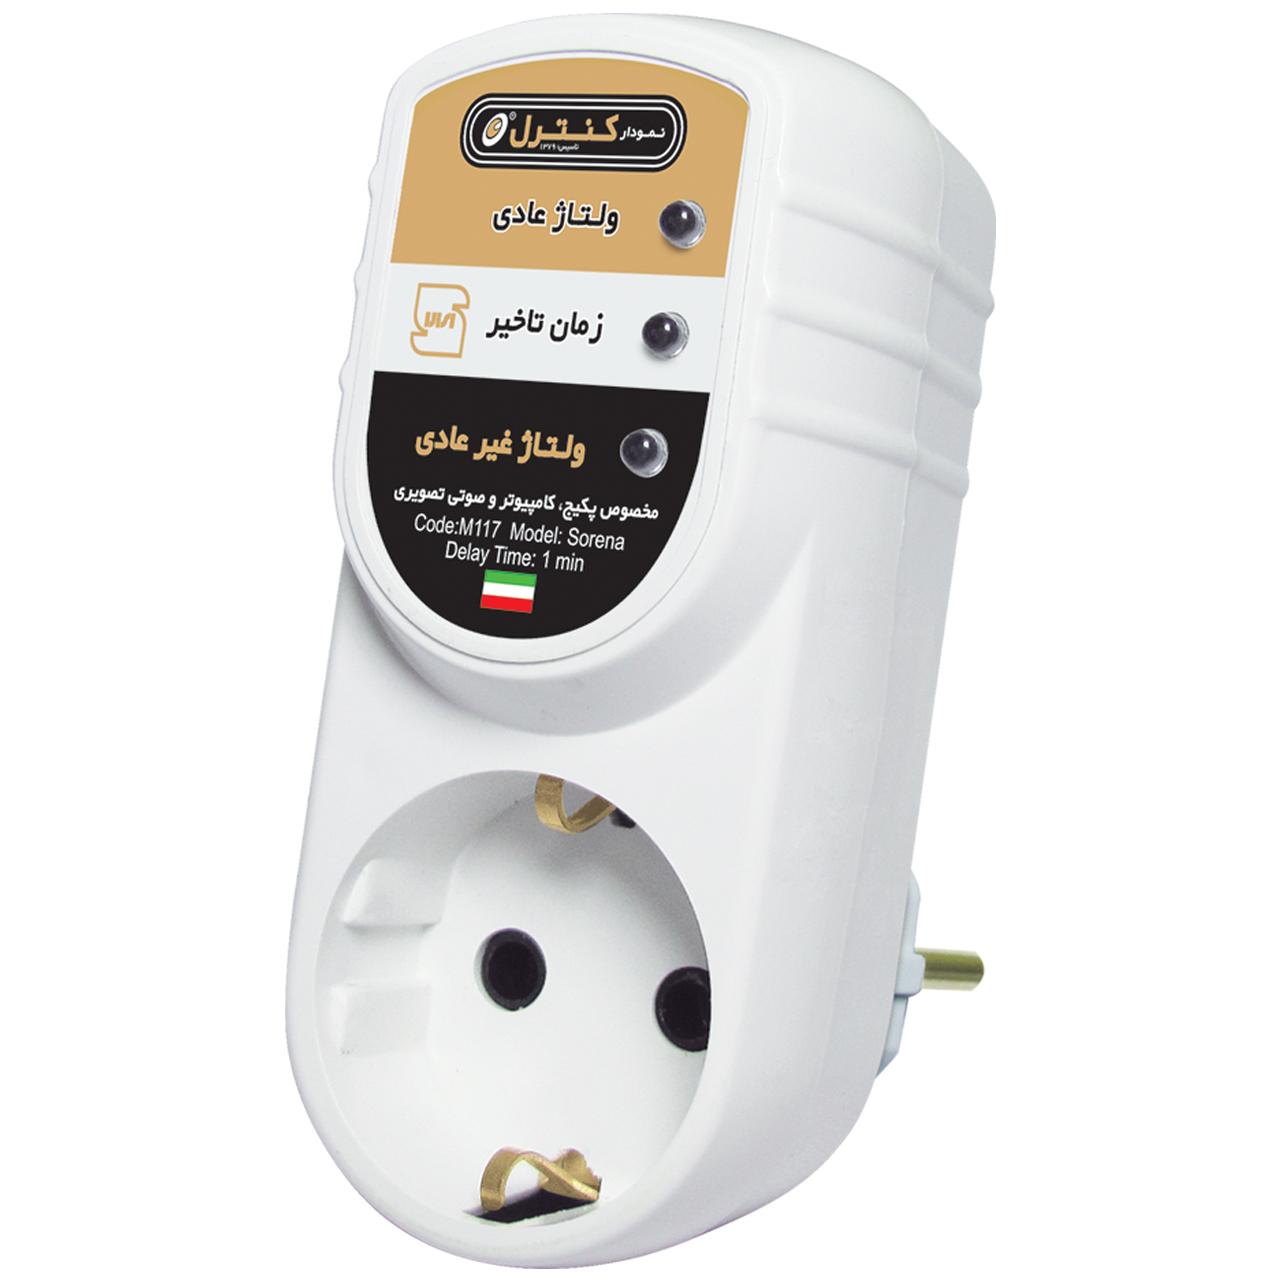 محافظ ولتاژ الکترونیکی نمودار کنترل مدل M117 طرح سورنا مناسب پکیج، کامپیوتر و لوازم صوتی تصویری